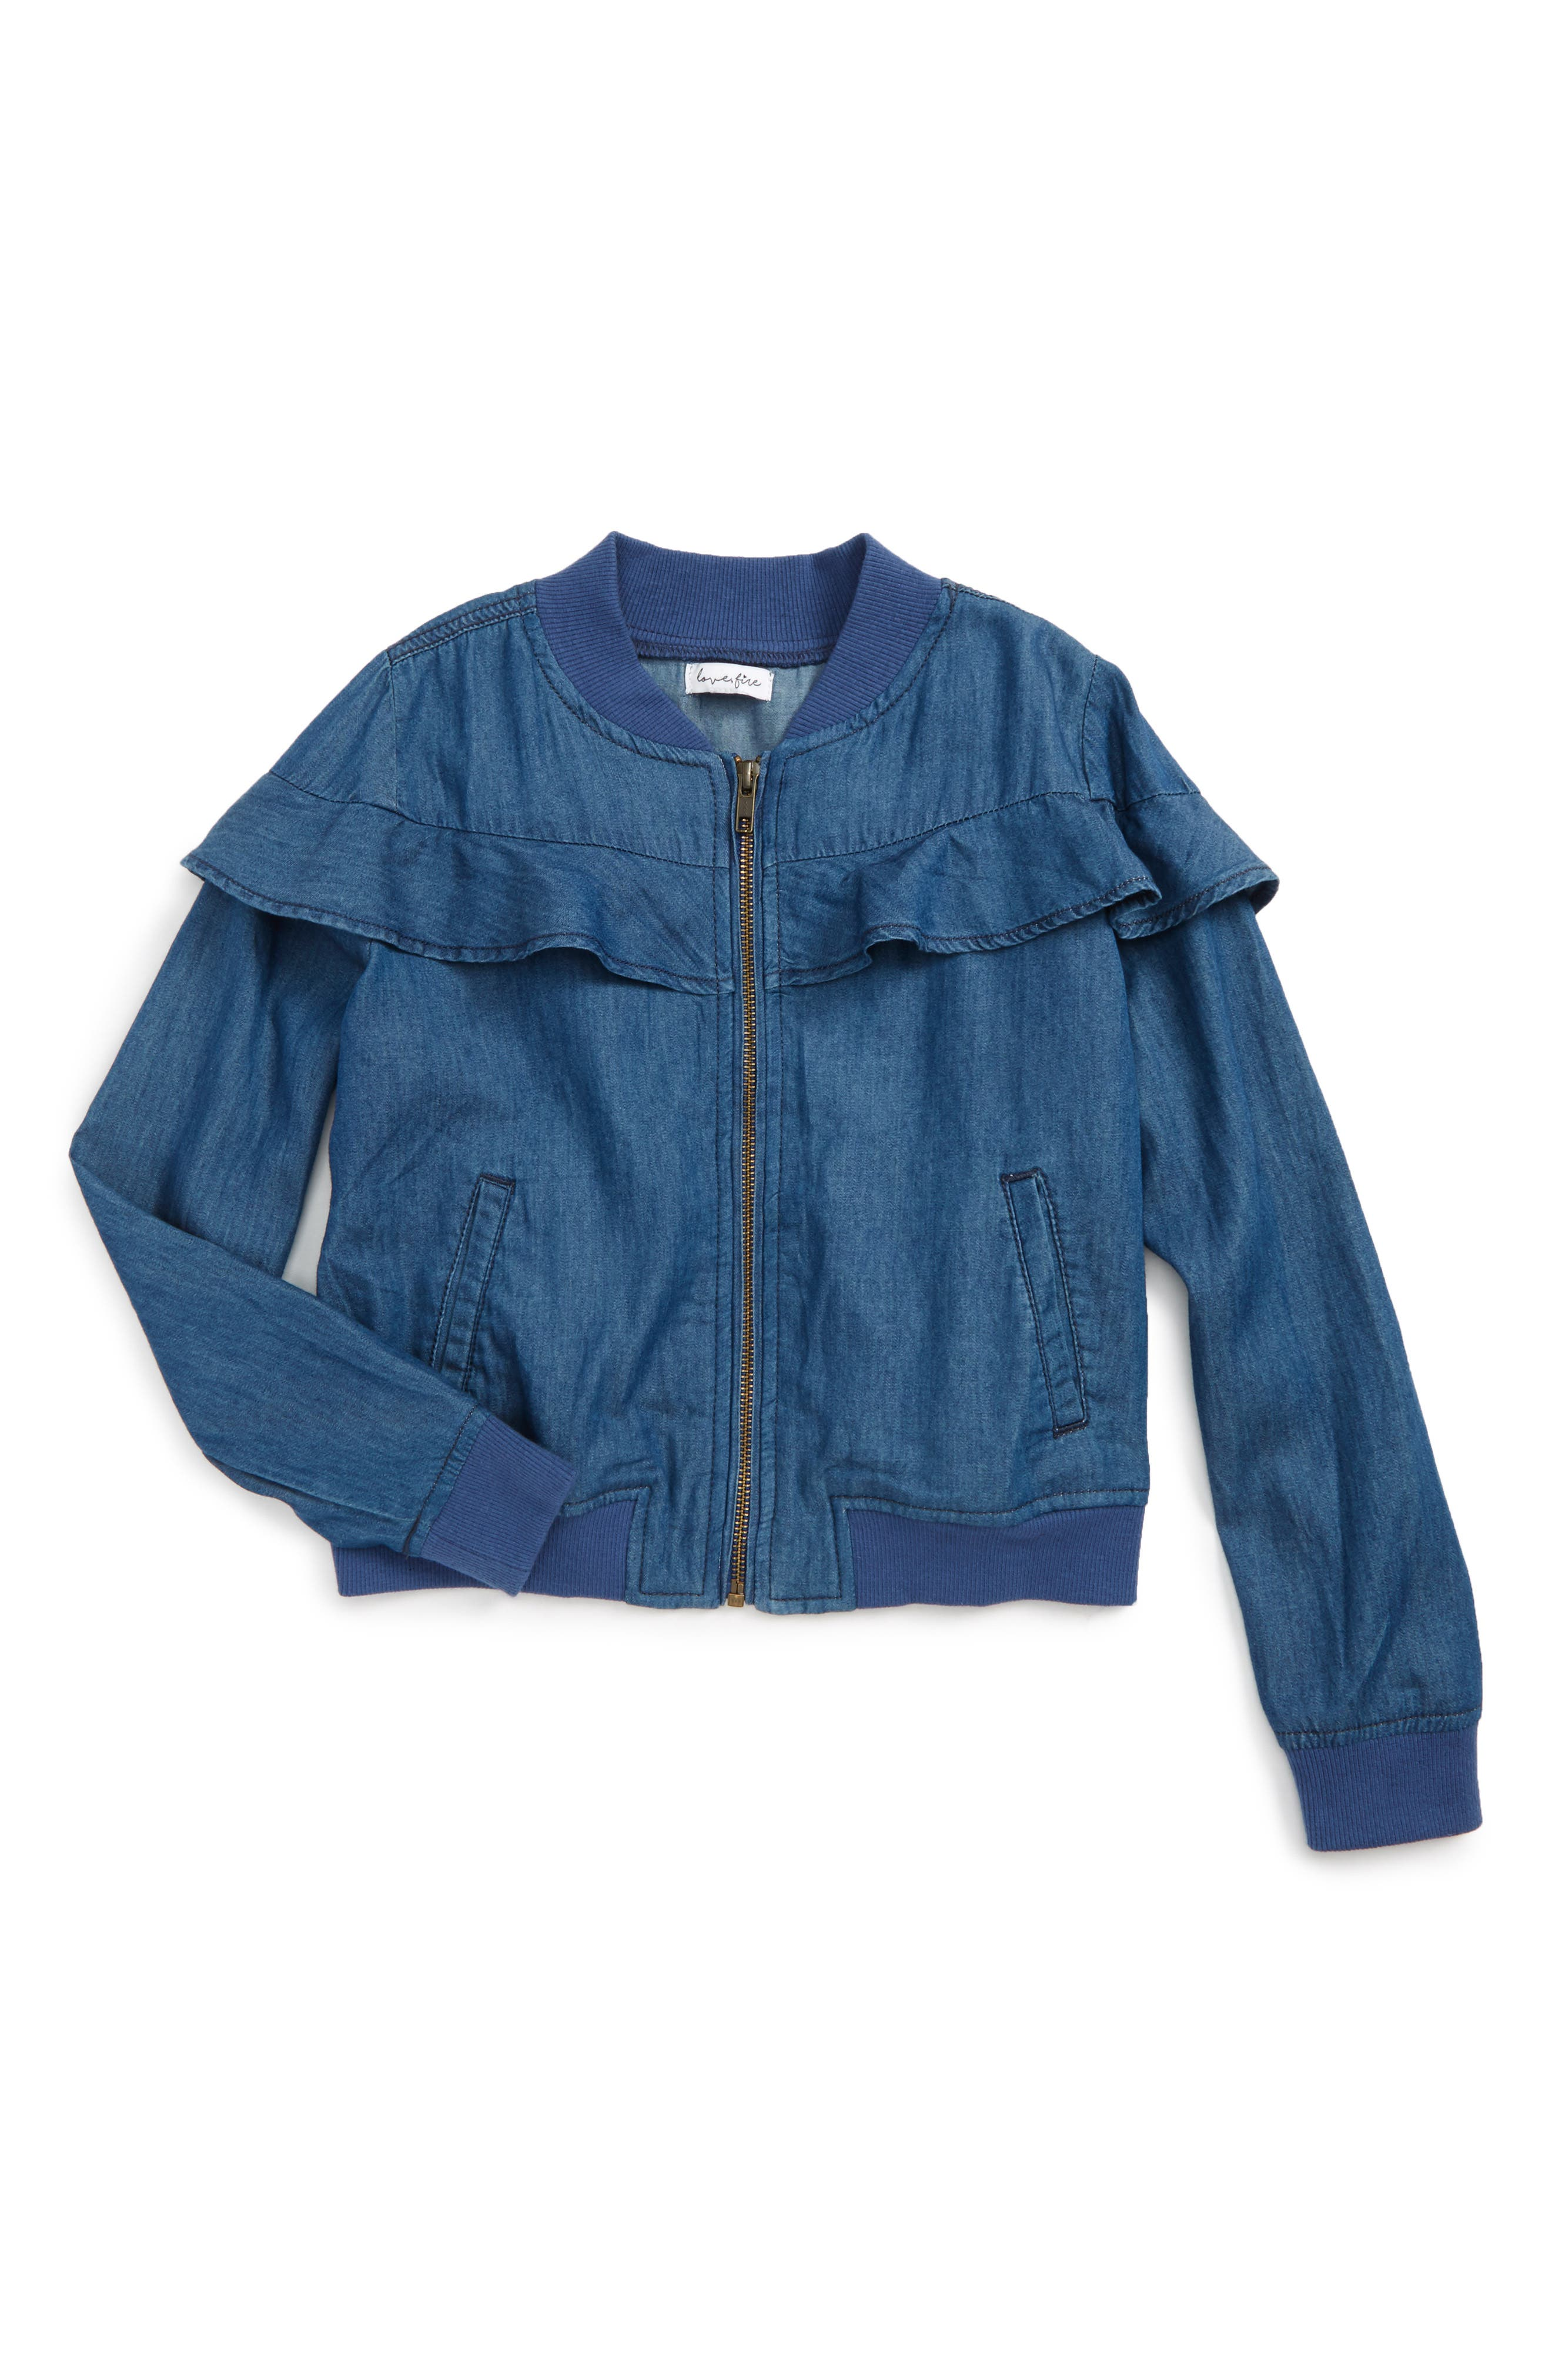 Ruffle Denim Jacket,                             Main thumbnail 1, color,                             Host Wash Blue